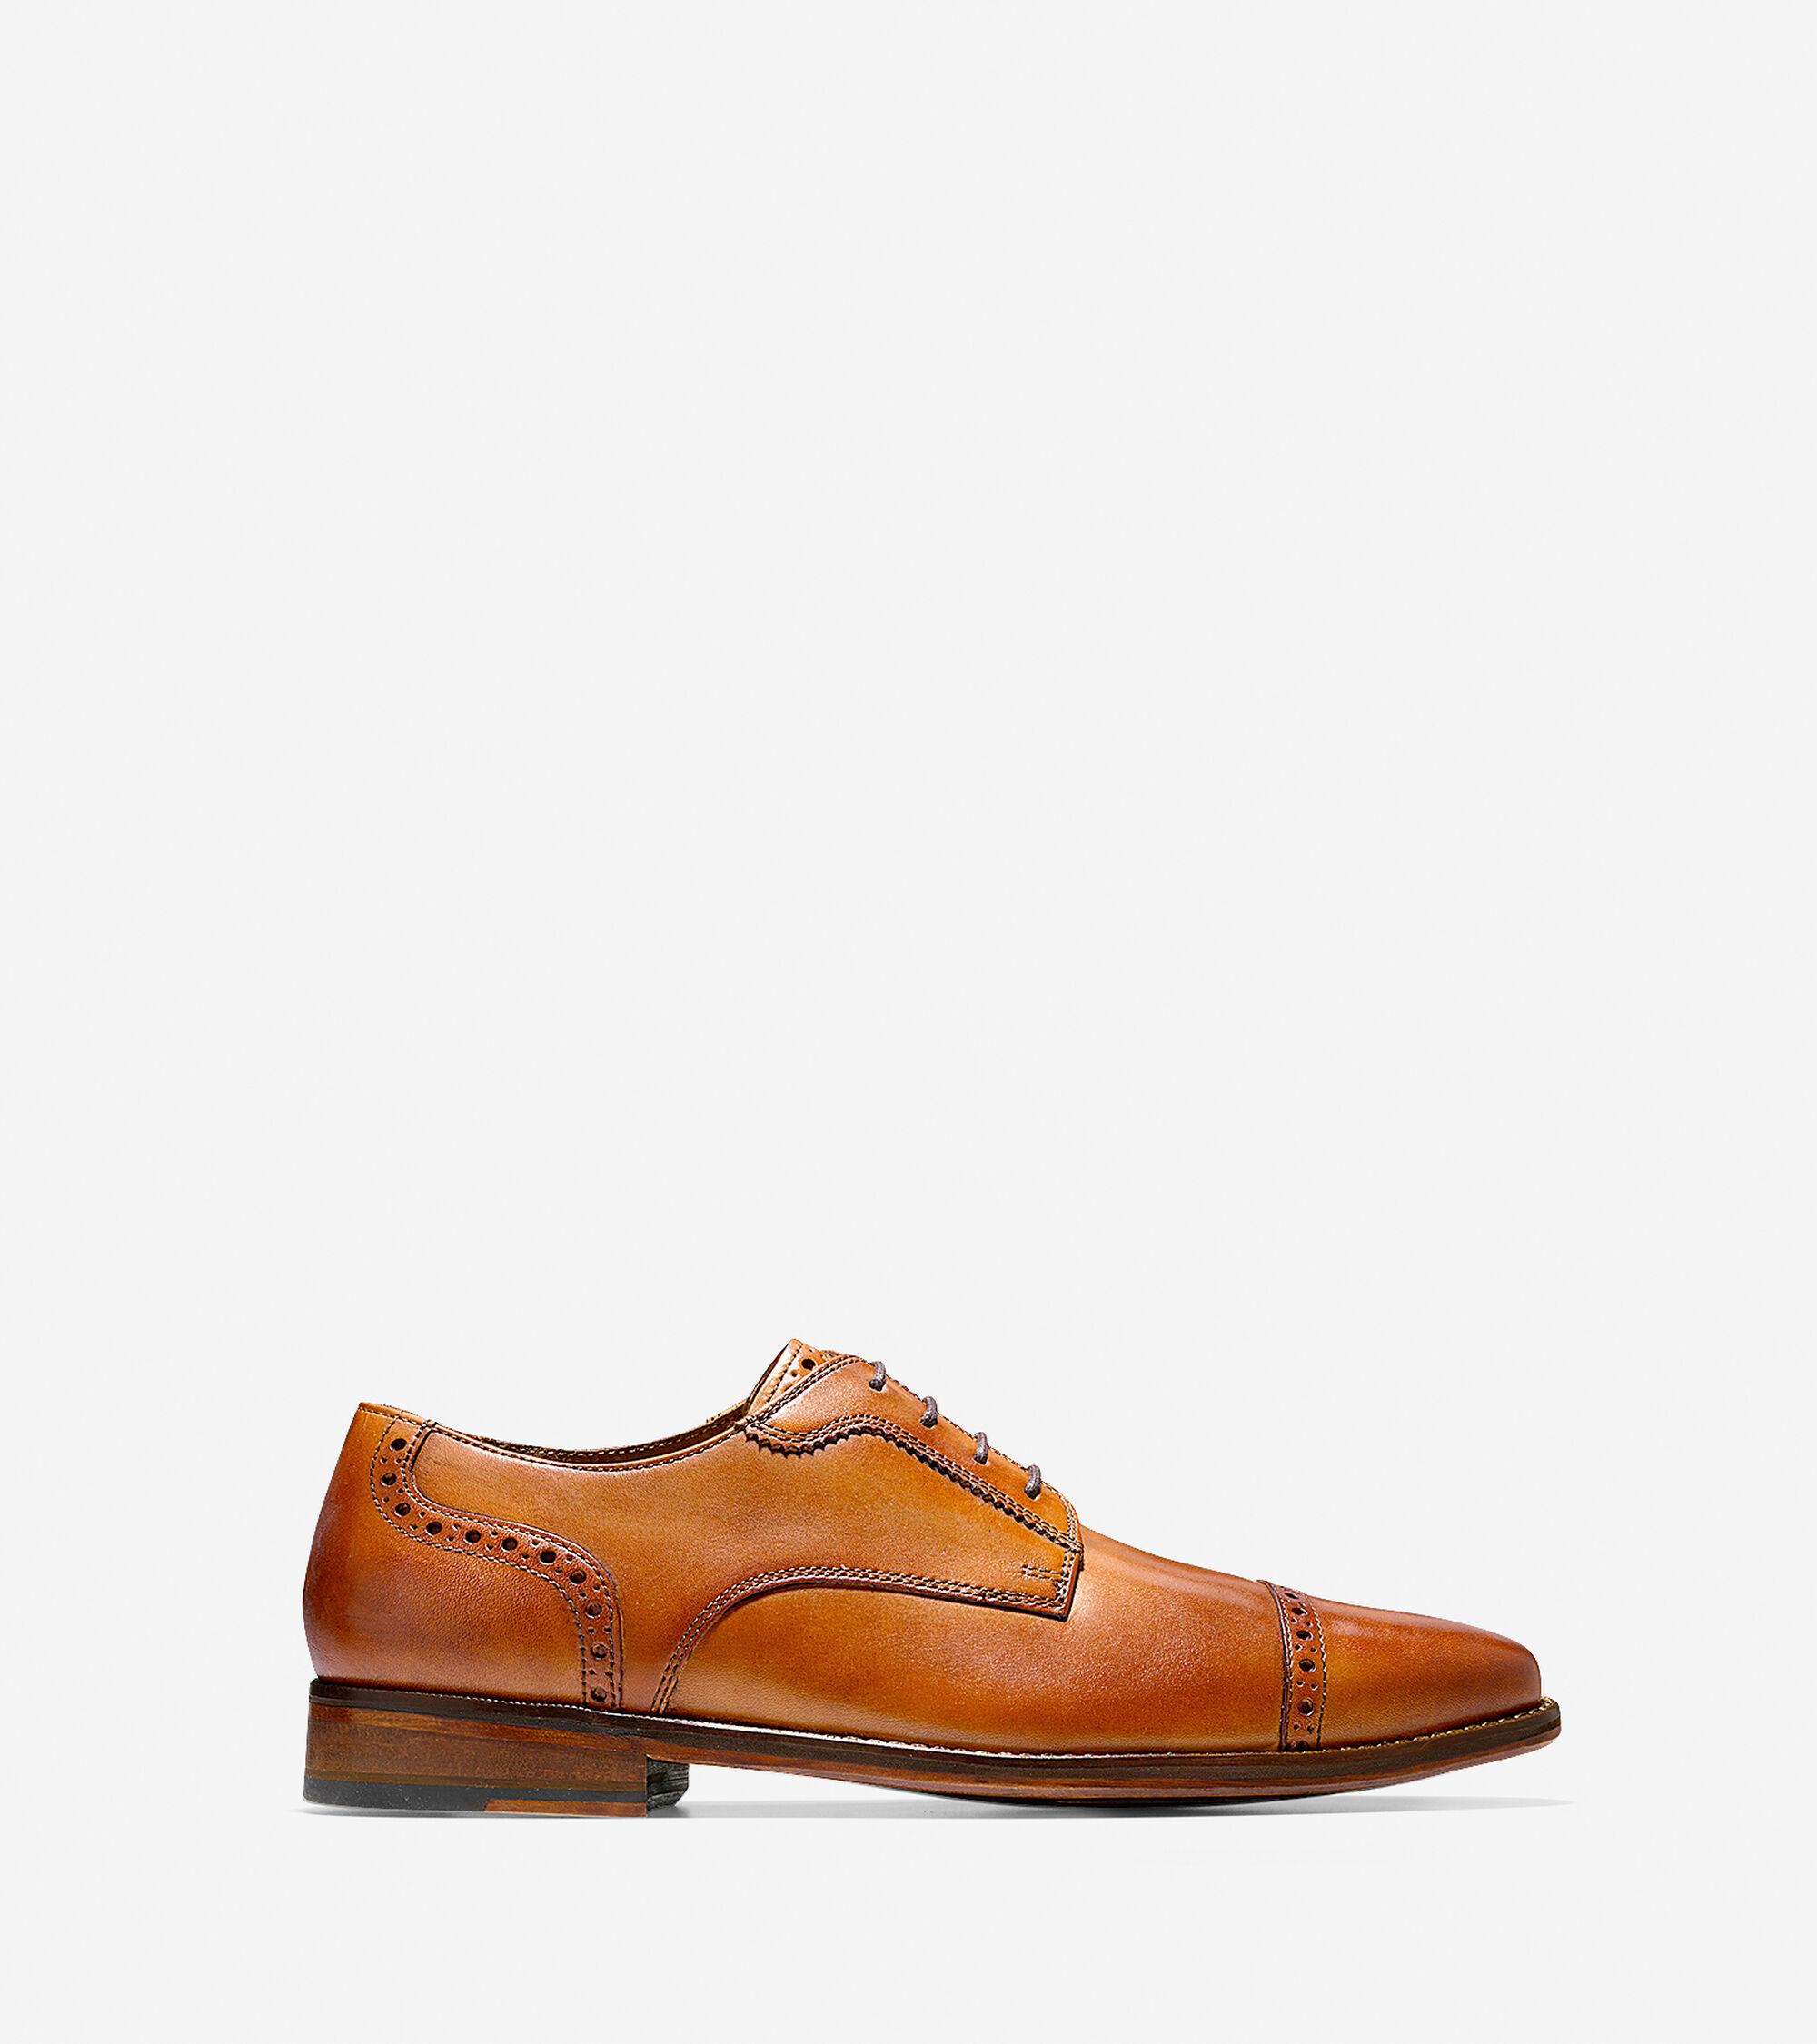 7143a979756 Men s Giraldo Luxe Cap Oxfords in British Tan   Sale